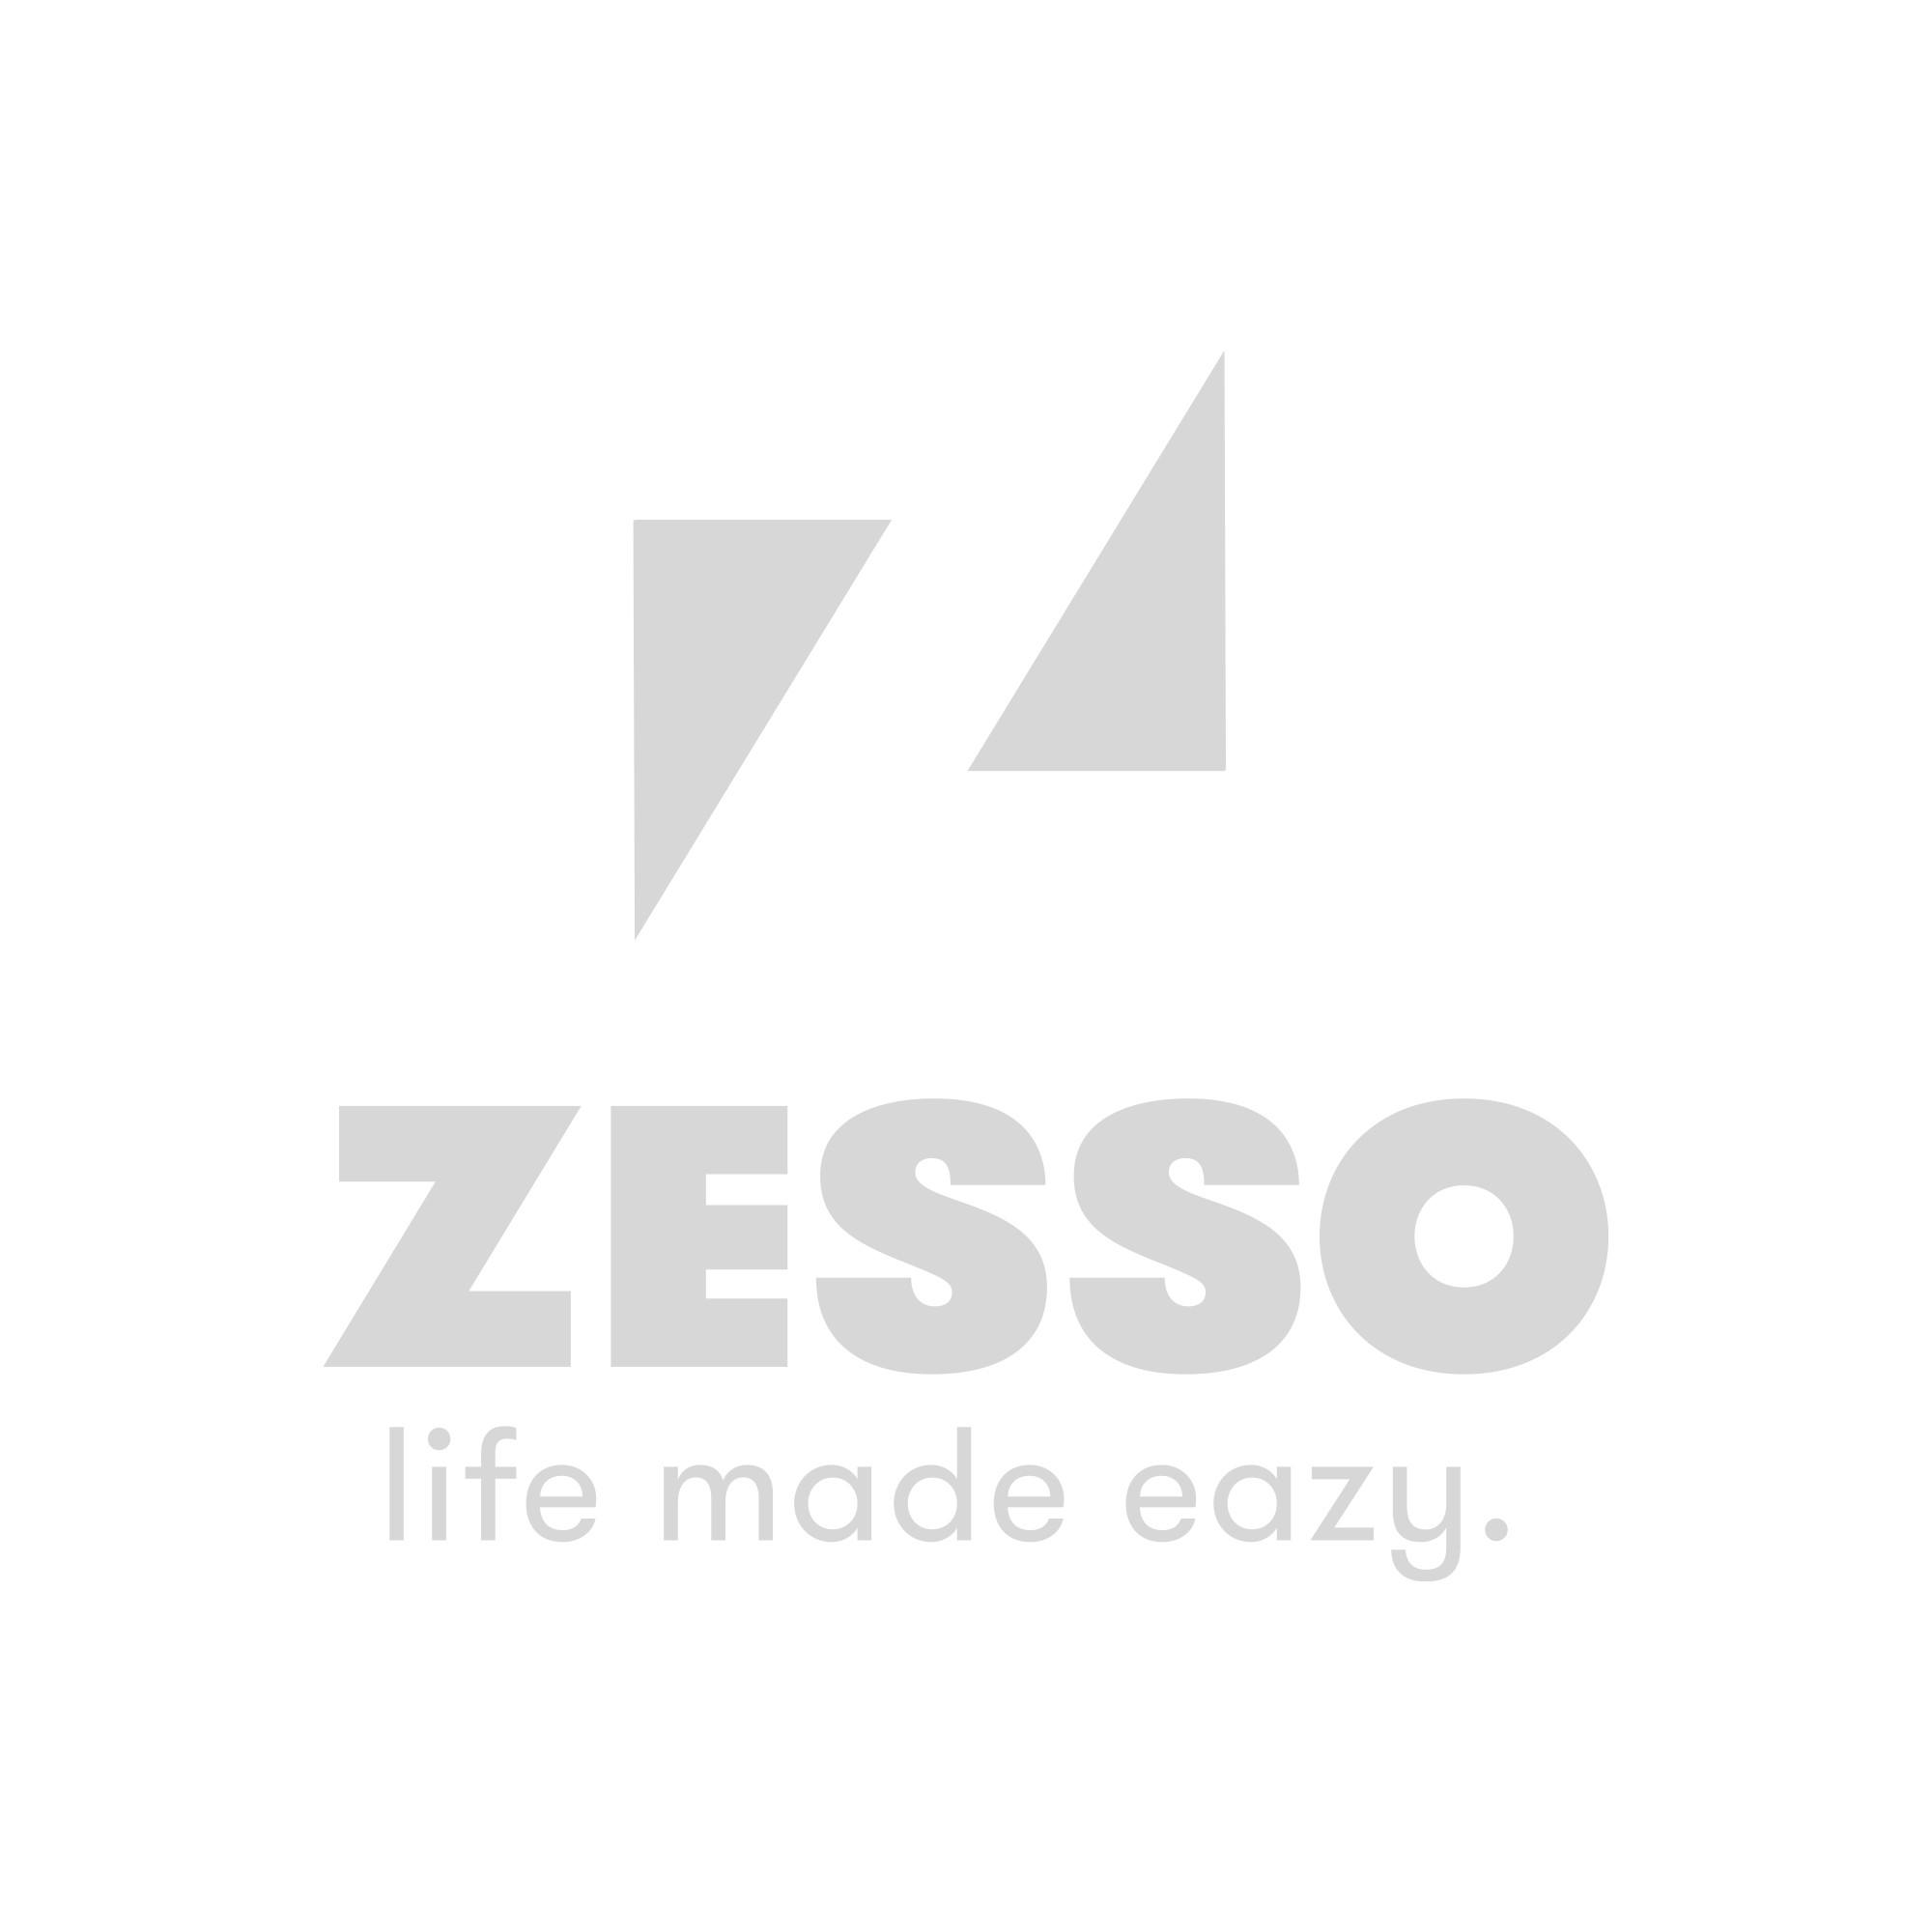 Baninni Loopfiets 2 - 3 Jaar Wheely Zwart